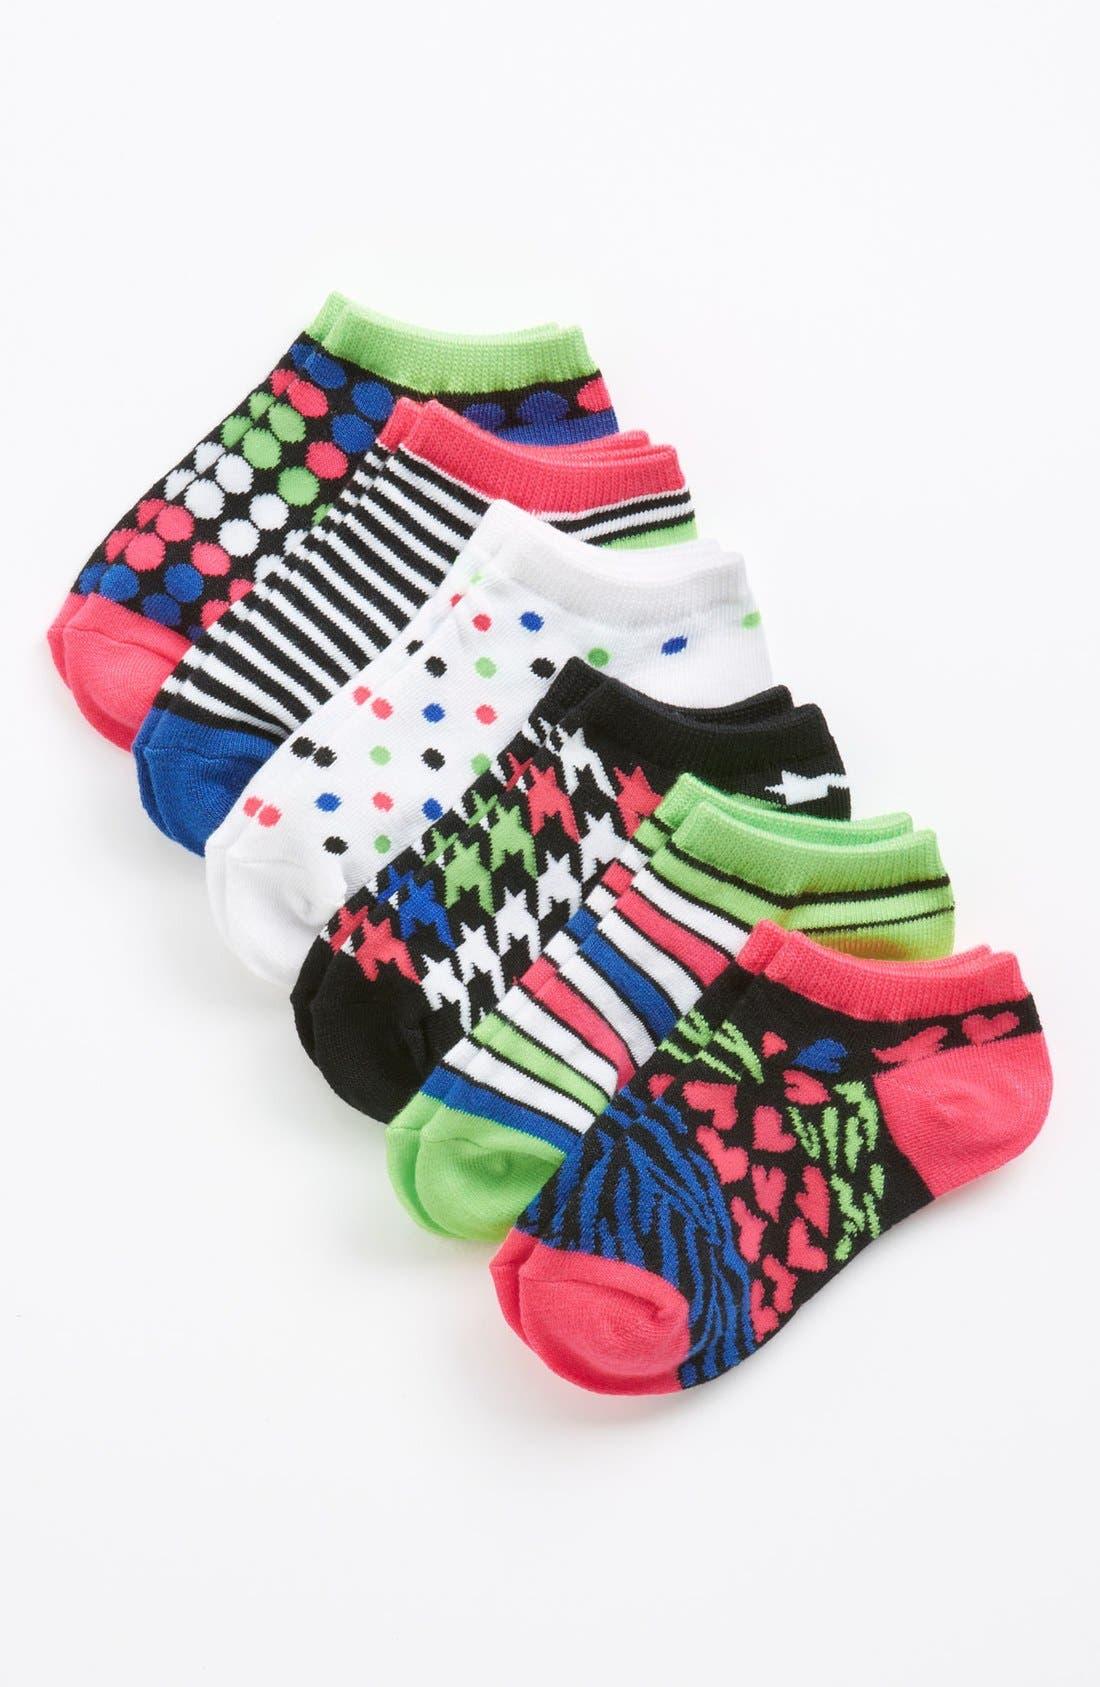 Main Image - Nordstrom 'Mod Mix' Low Cut Socks (6-Pack) (Toddler, Little Girls & Big Girls)